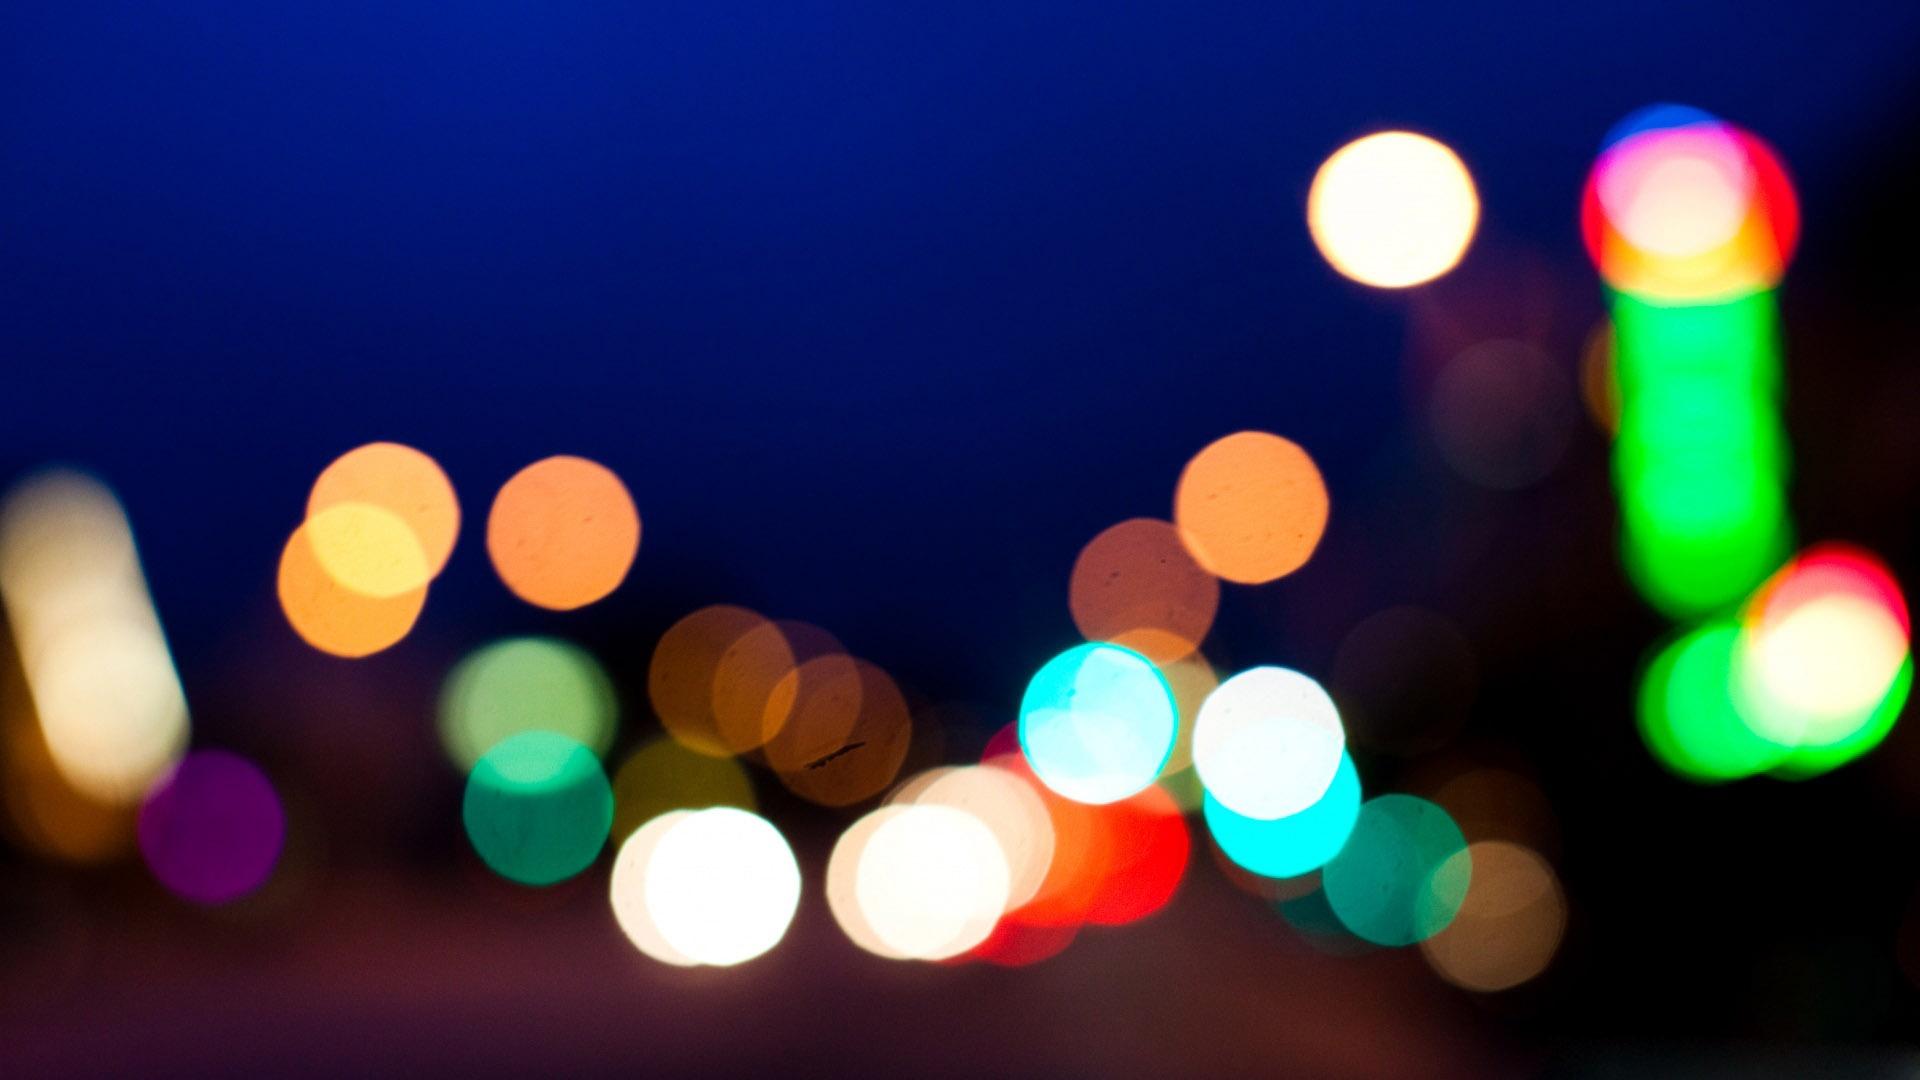 Light Up download wallpaper image